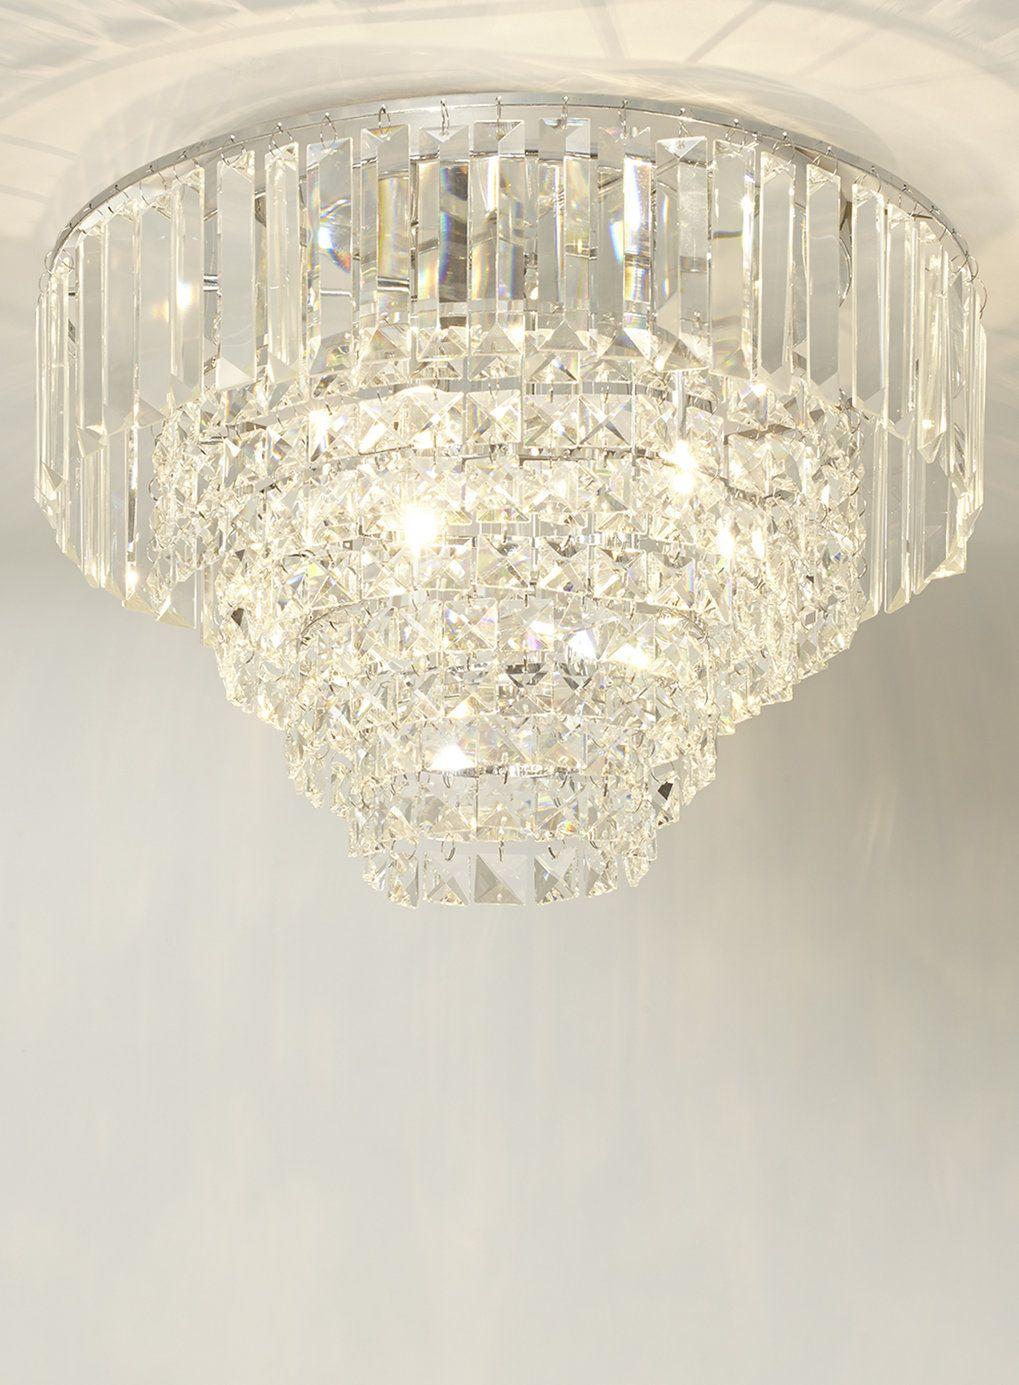 60 off large paladina flush light ideas for the house 60 off large paladina flush light mozeypictures Choice Image